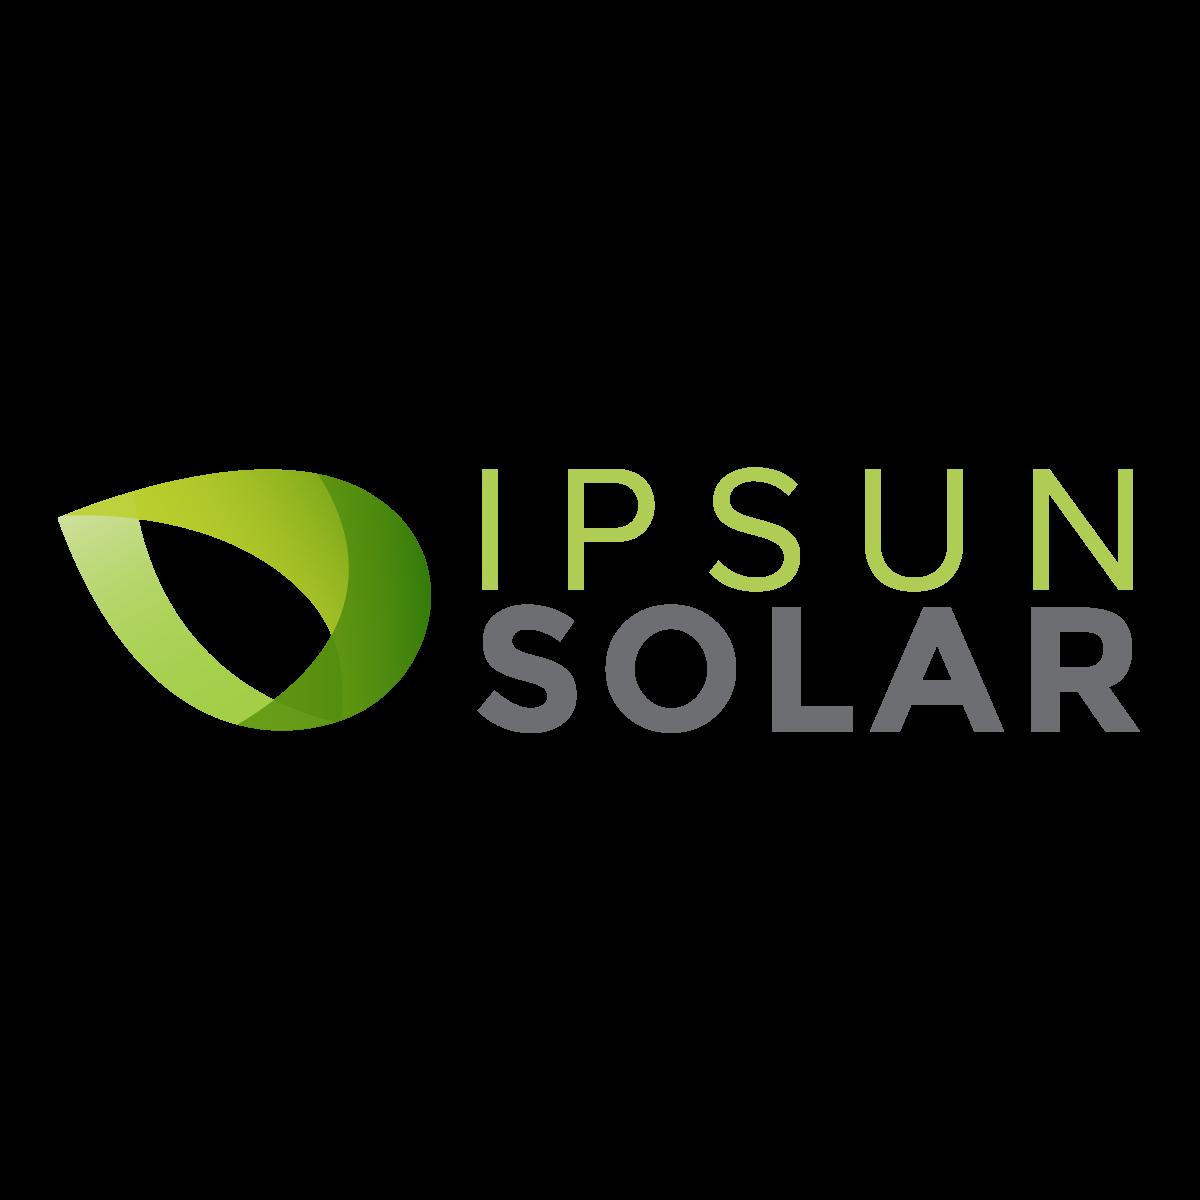 Ipsun-Solar